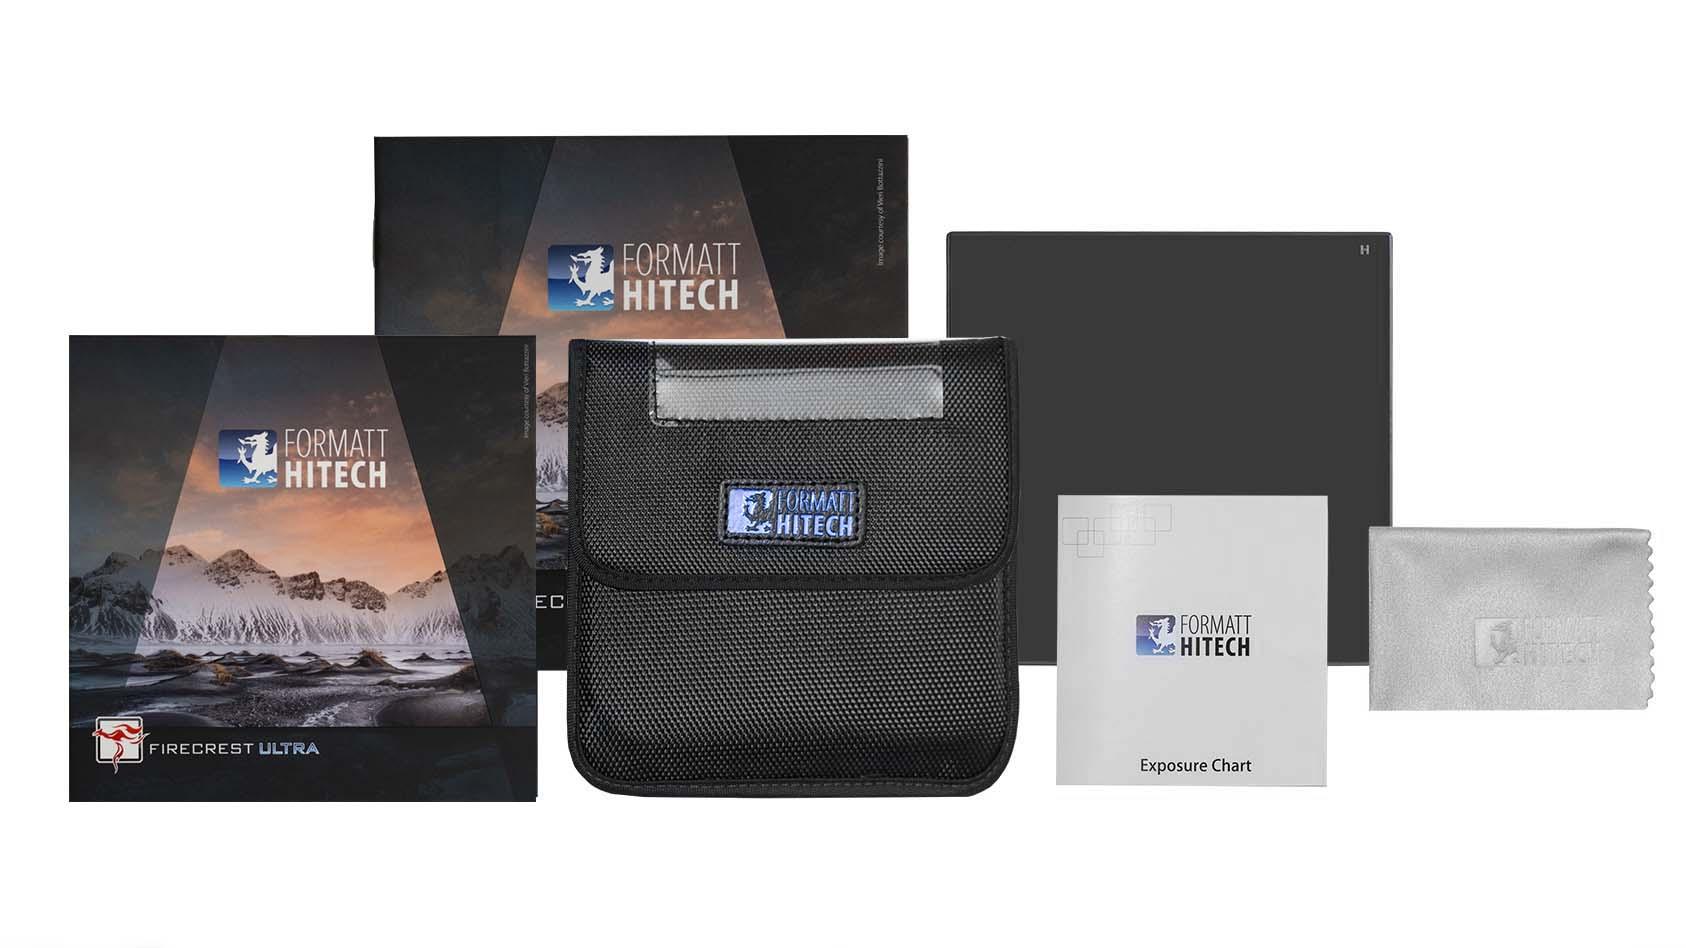 top lens filters 2020 hitech image